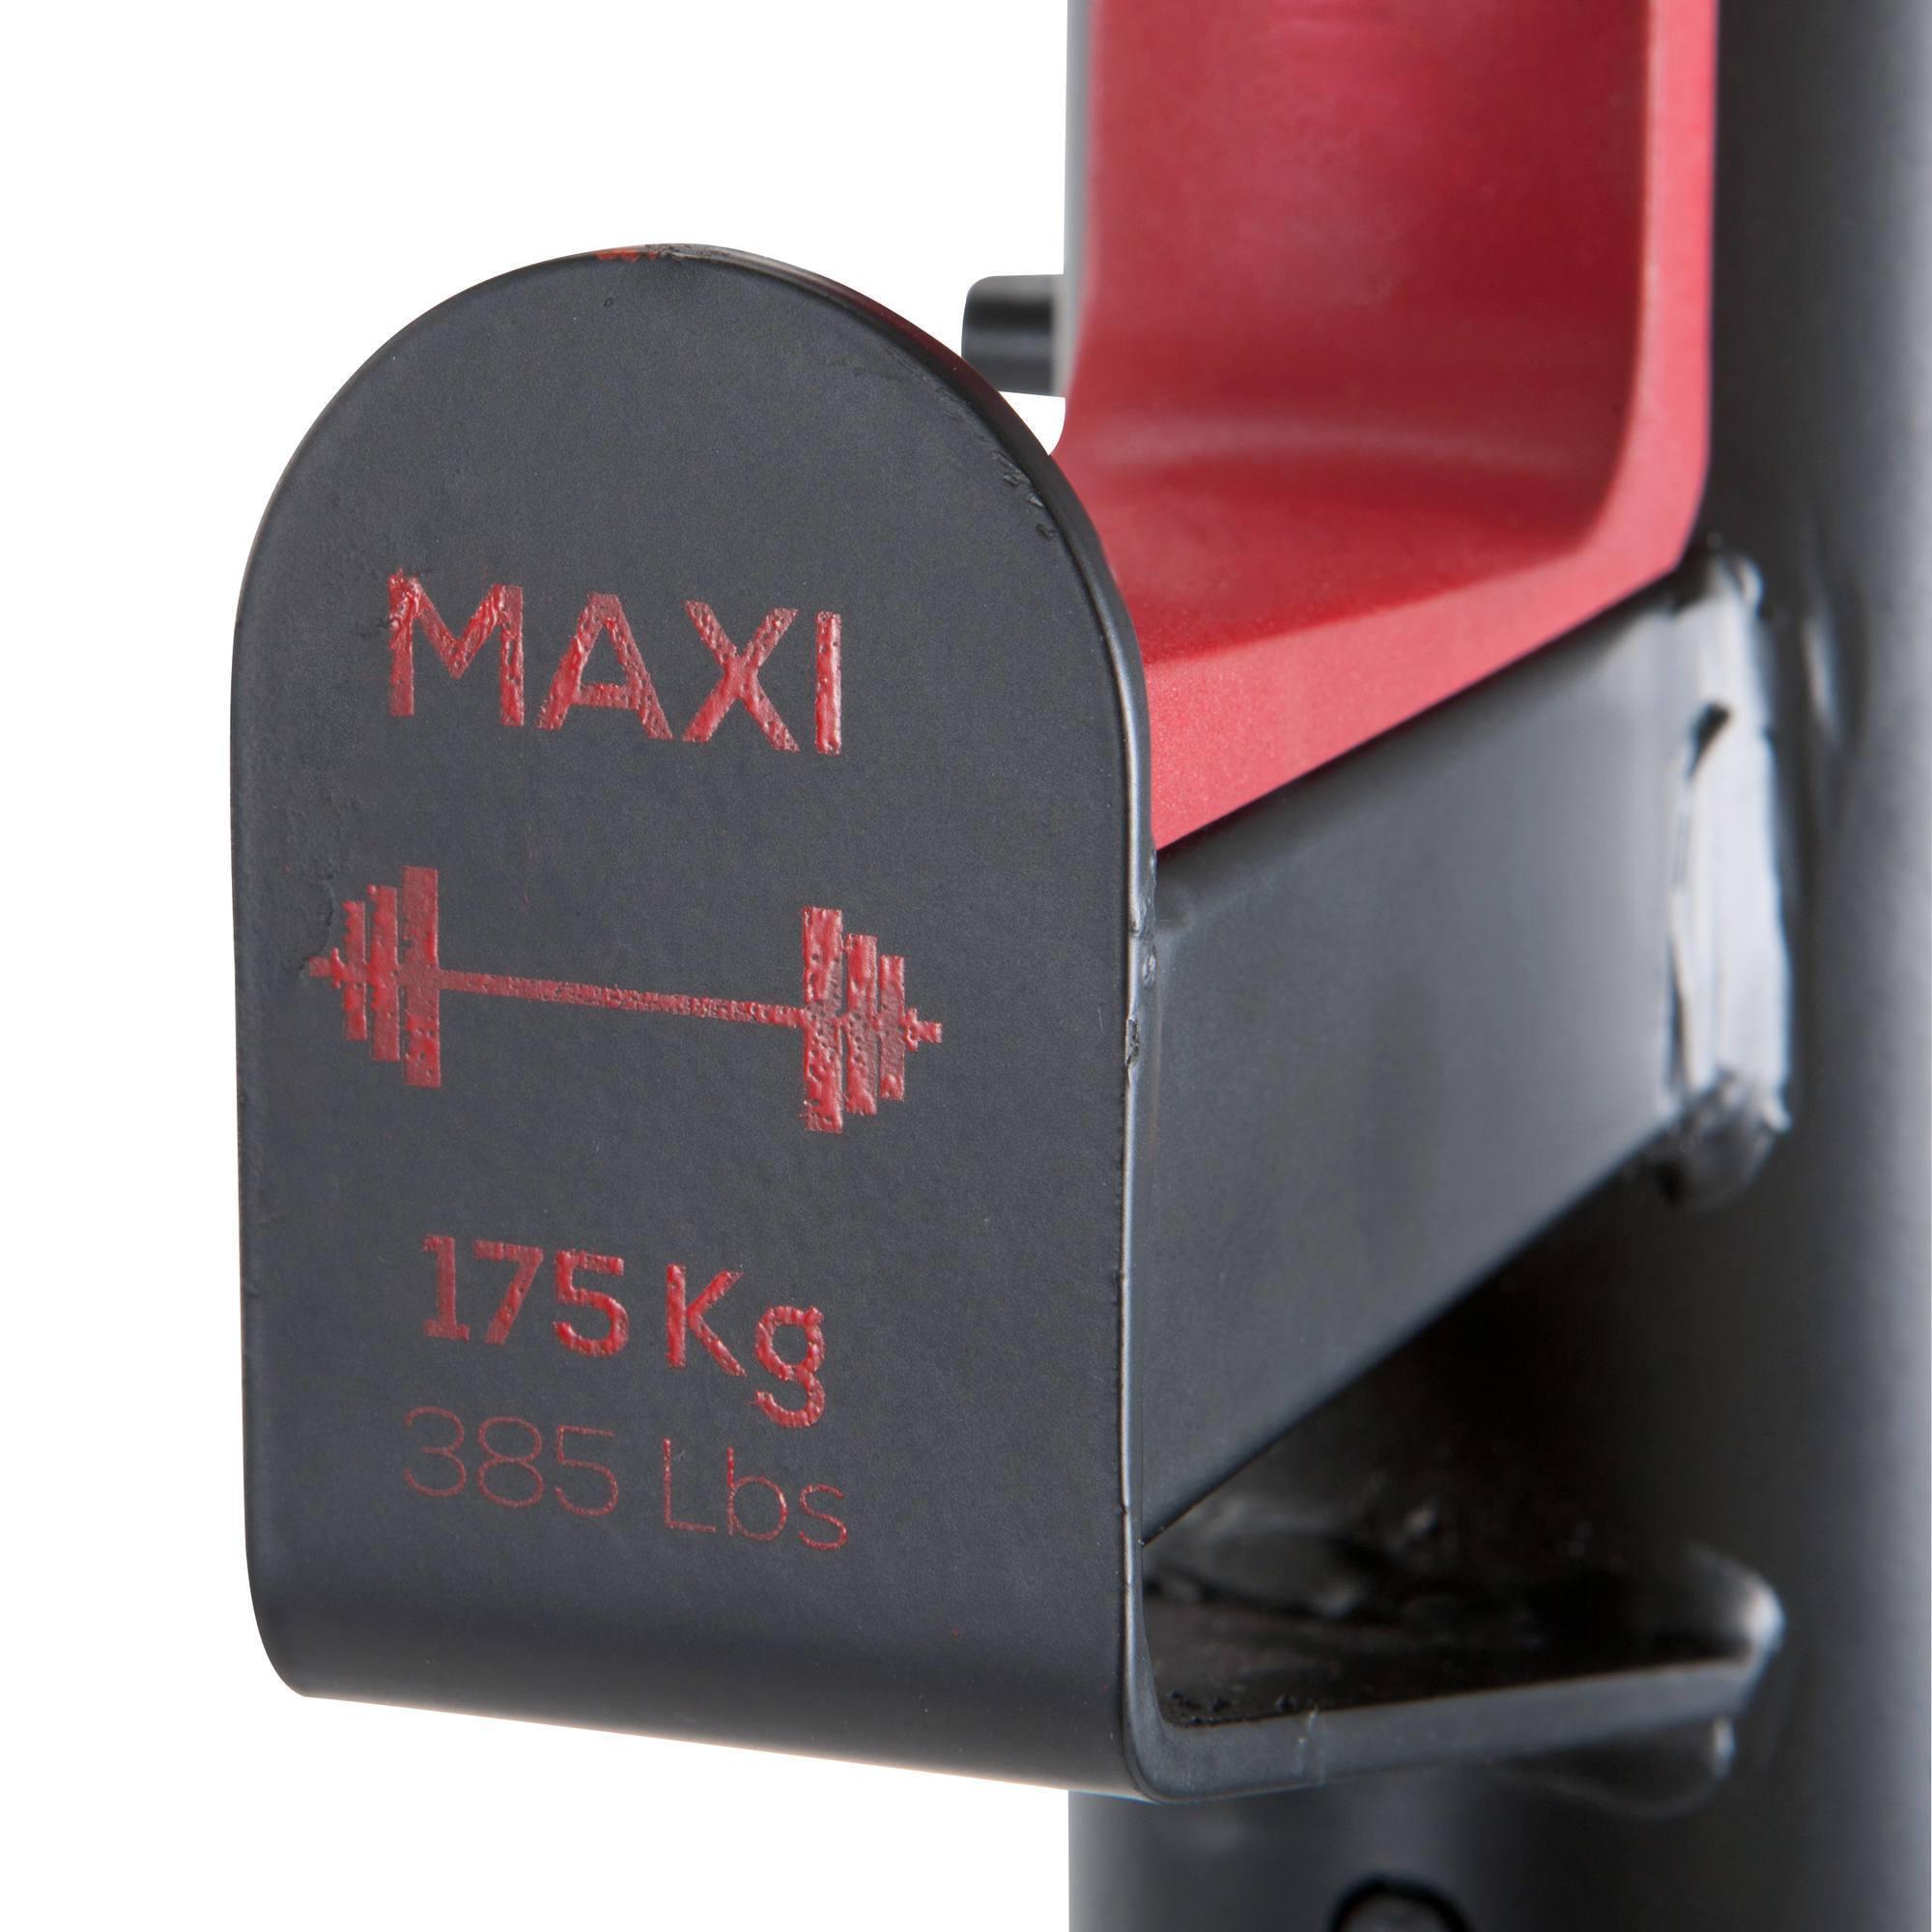 Rack Musculation 500 Clubs Collectivit S Decathlon Pro